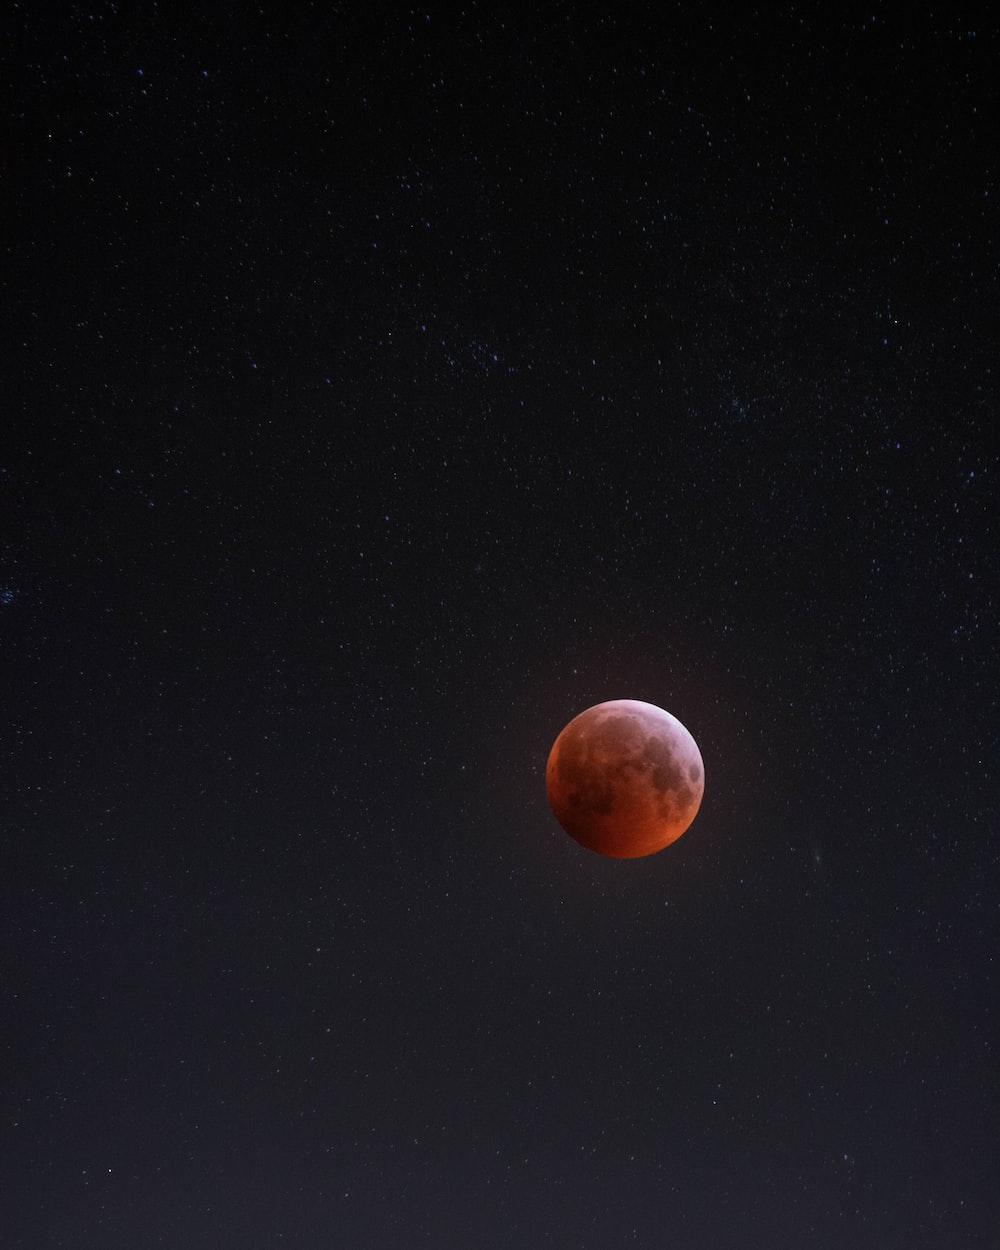 Earth's blood moon